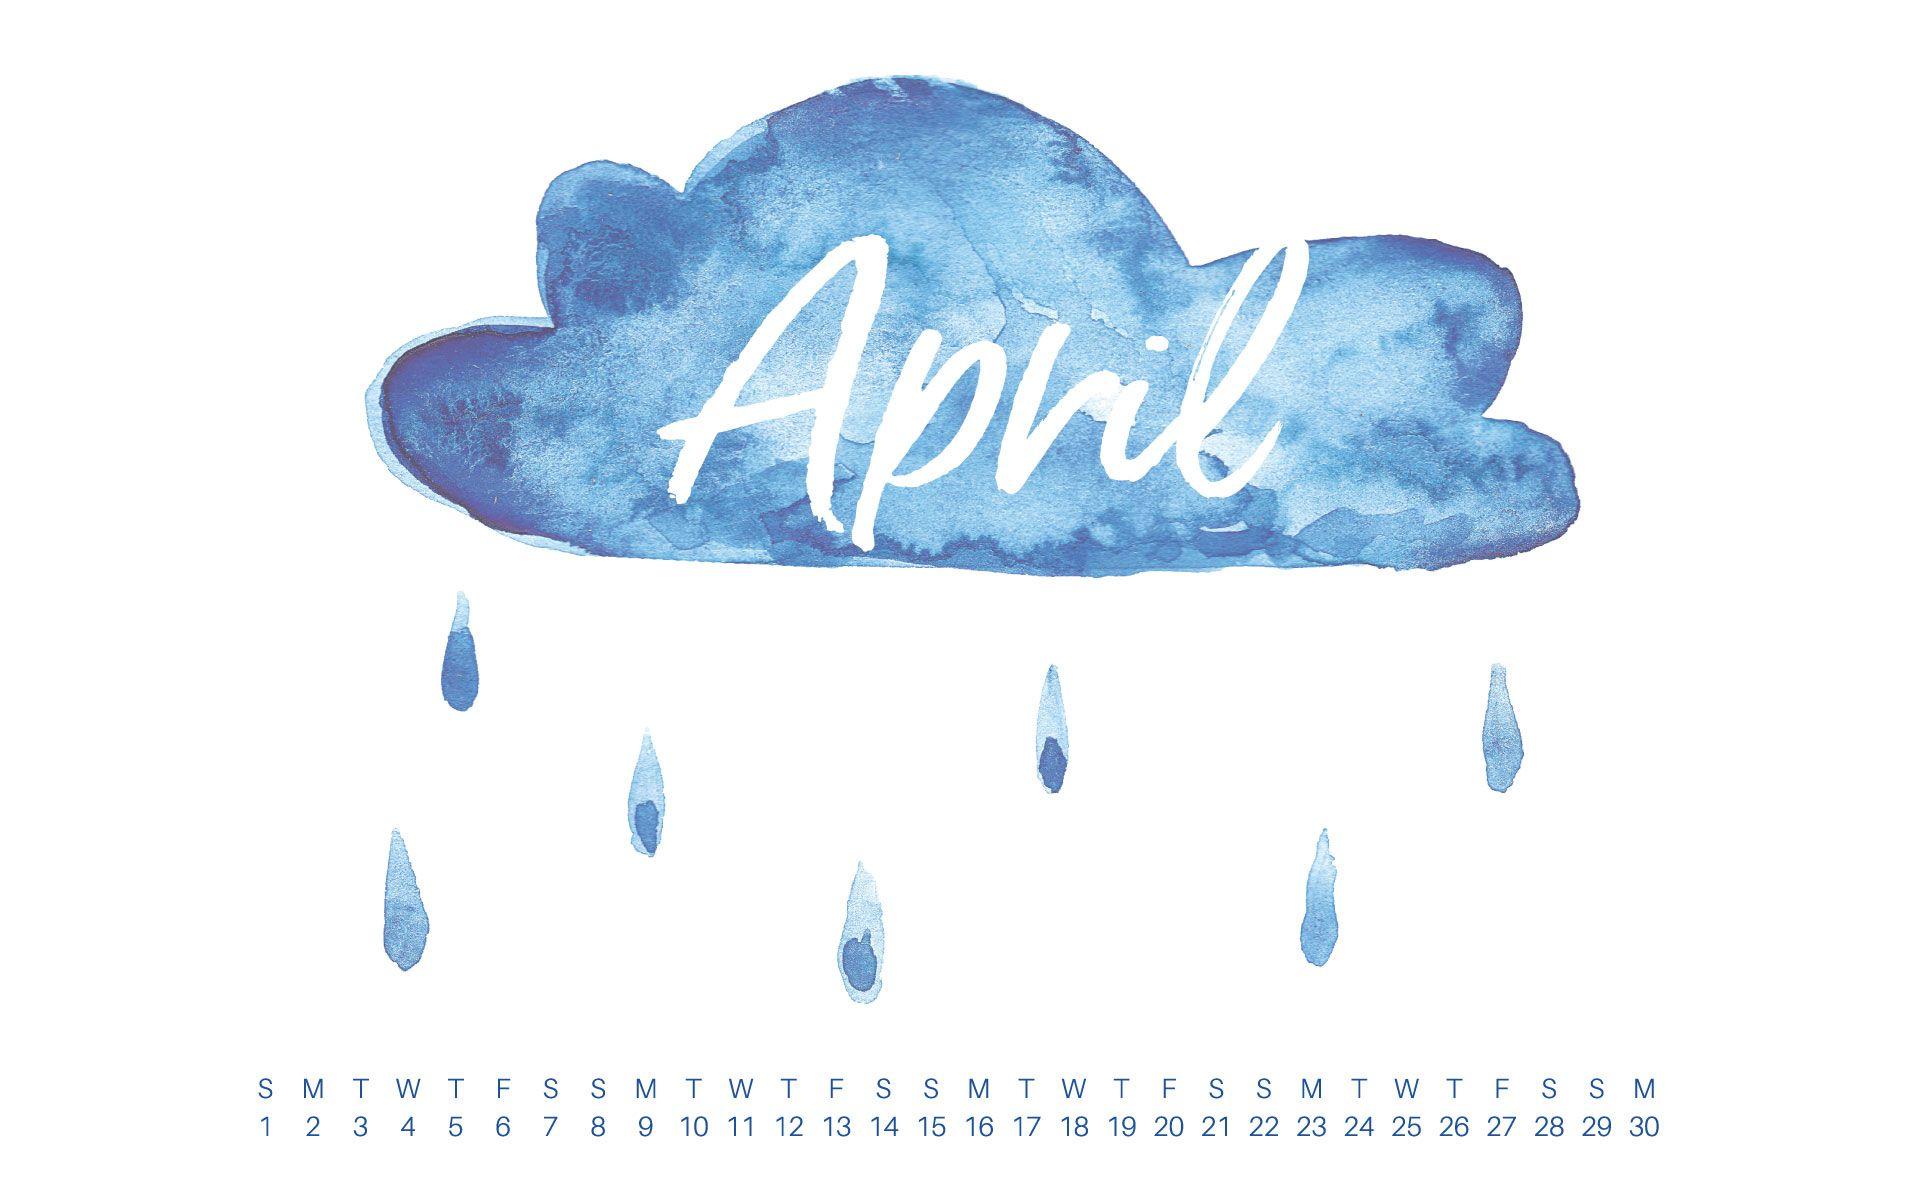 April Wallpaper Google Search Laptop Wallpaper Desktop Wallpapers Calendar Wallpaper Desktop Wallpaper Macbook